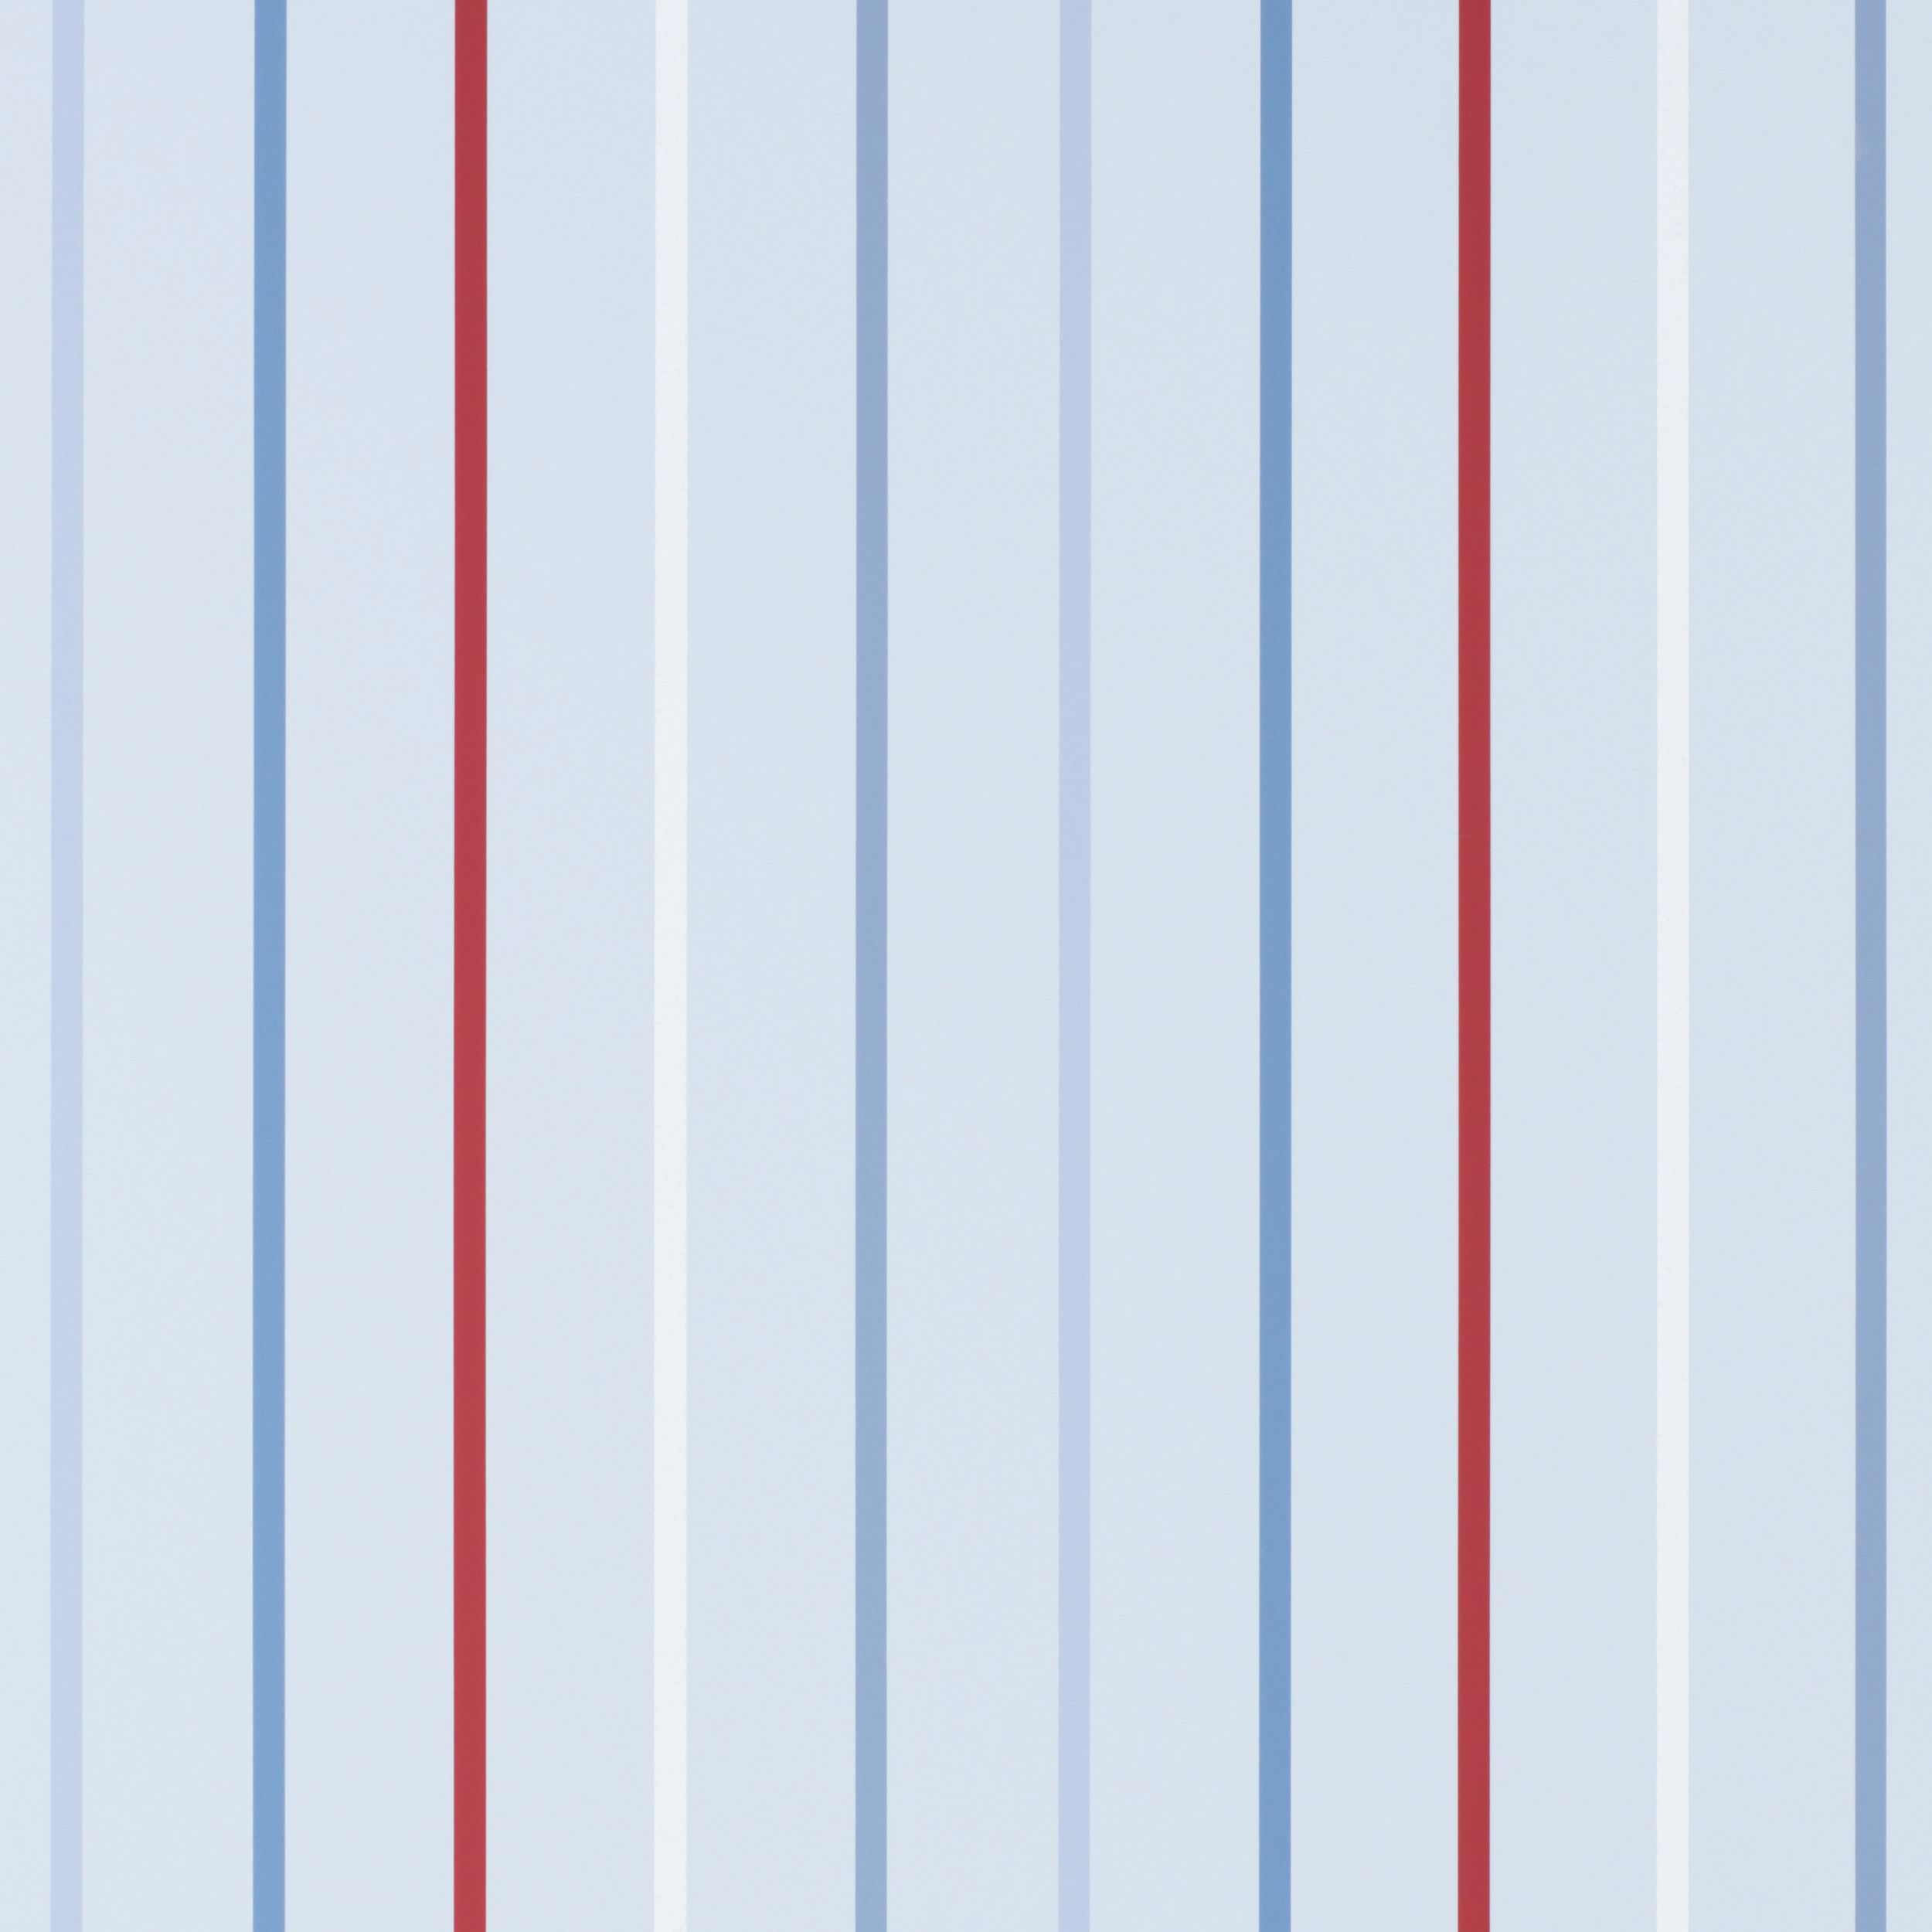 draycott multi blue striped childrens wallpaper from laura ashley